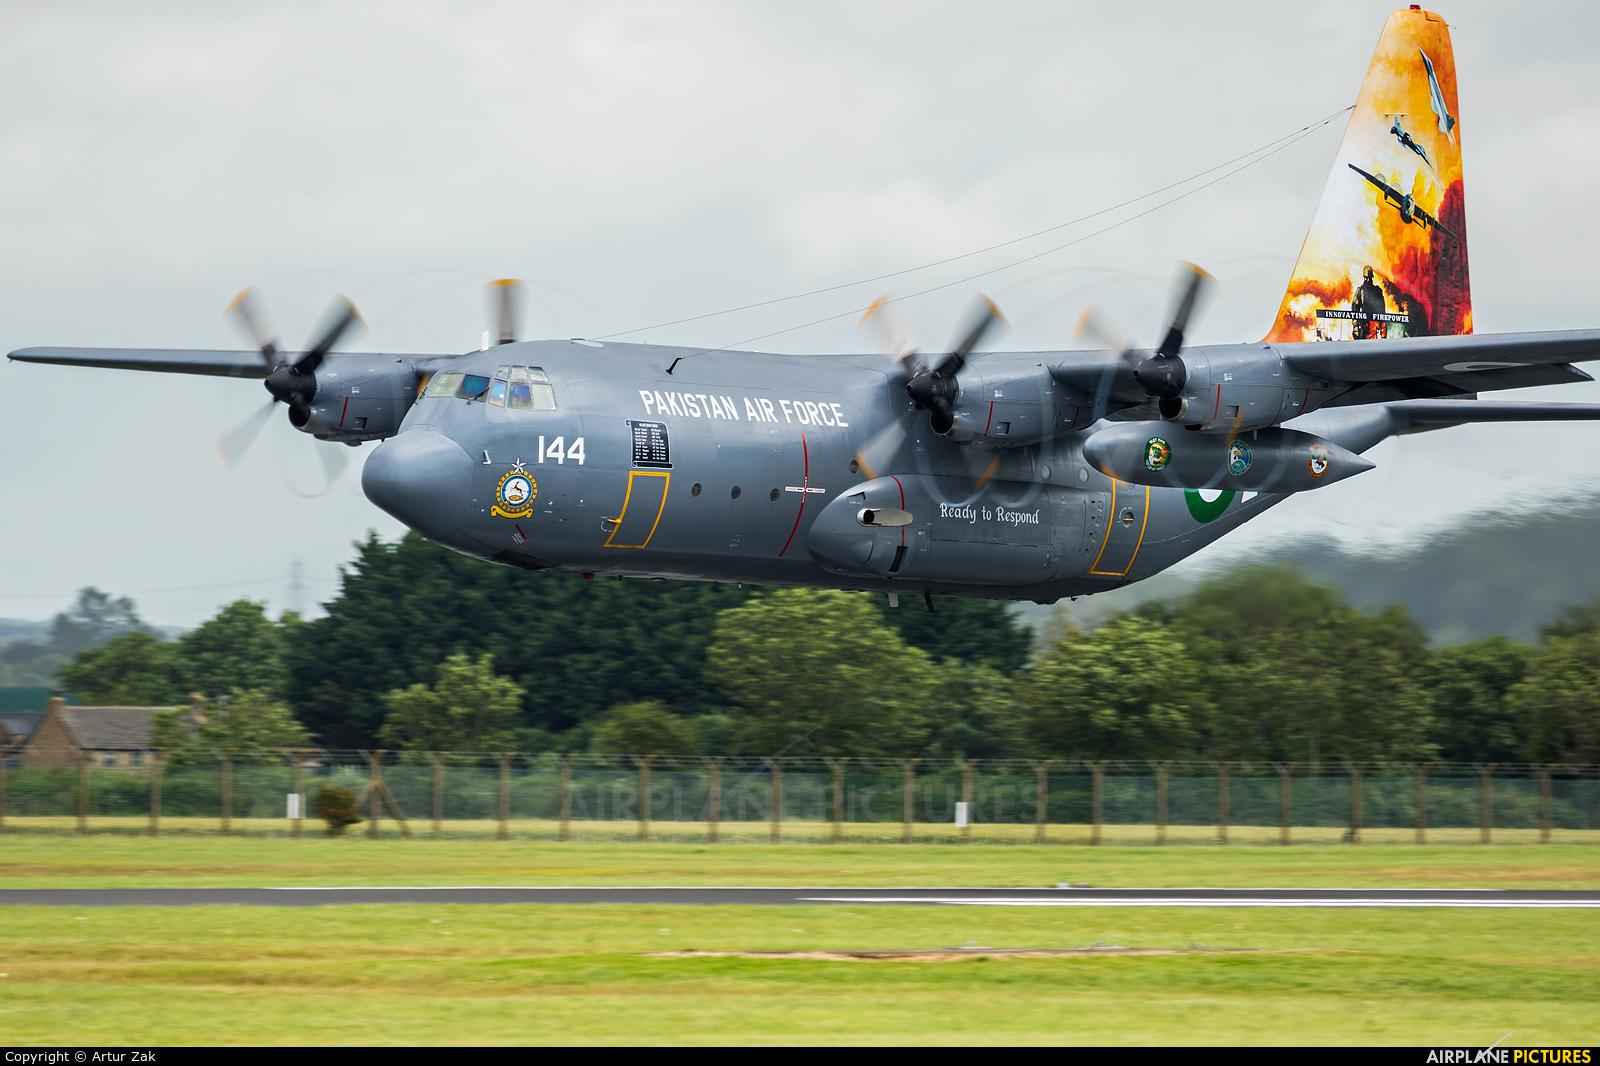 Pakistan - Air Force 144 aircraft at Fairford